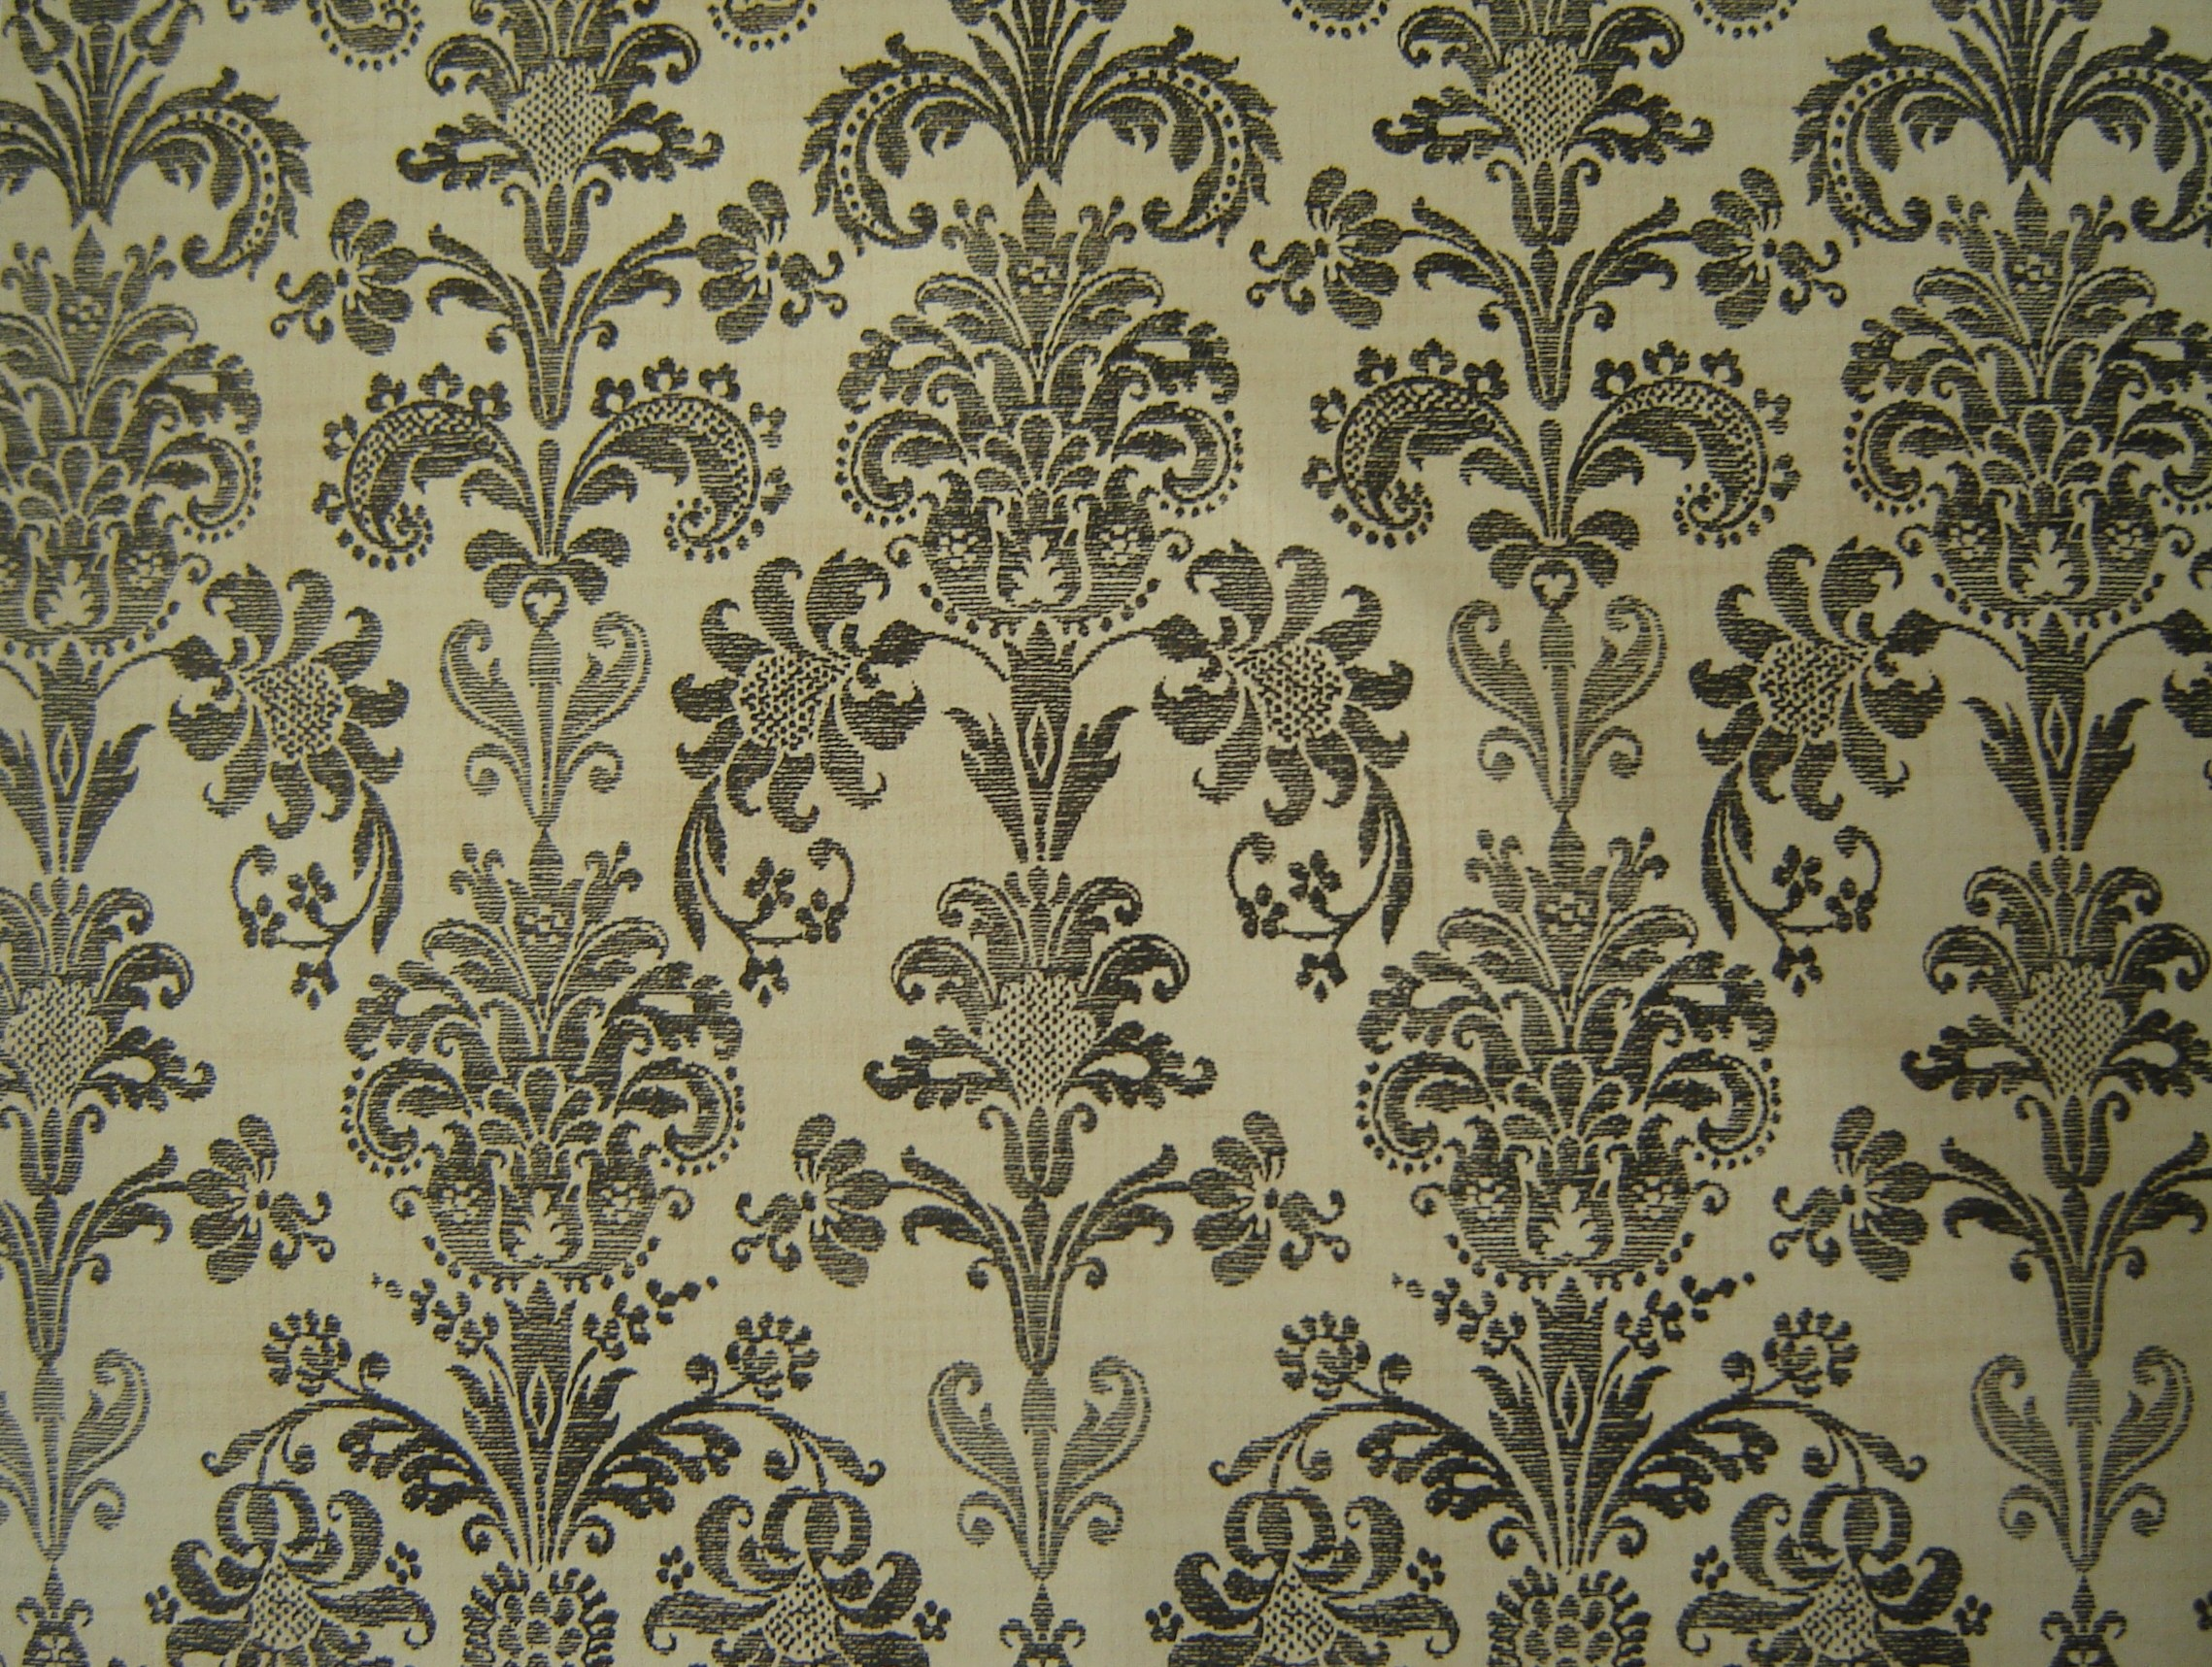 Wallpaper Paper 2278x1717